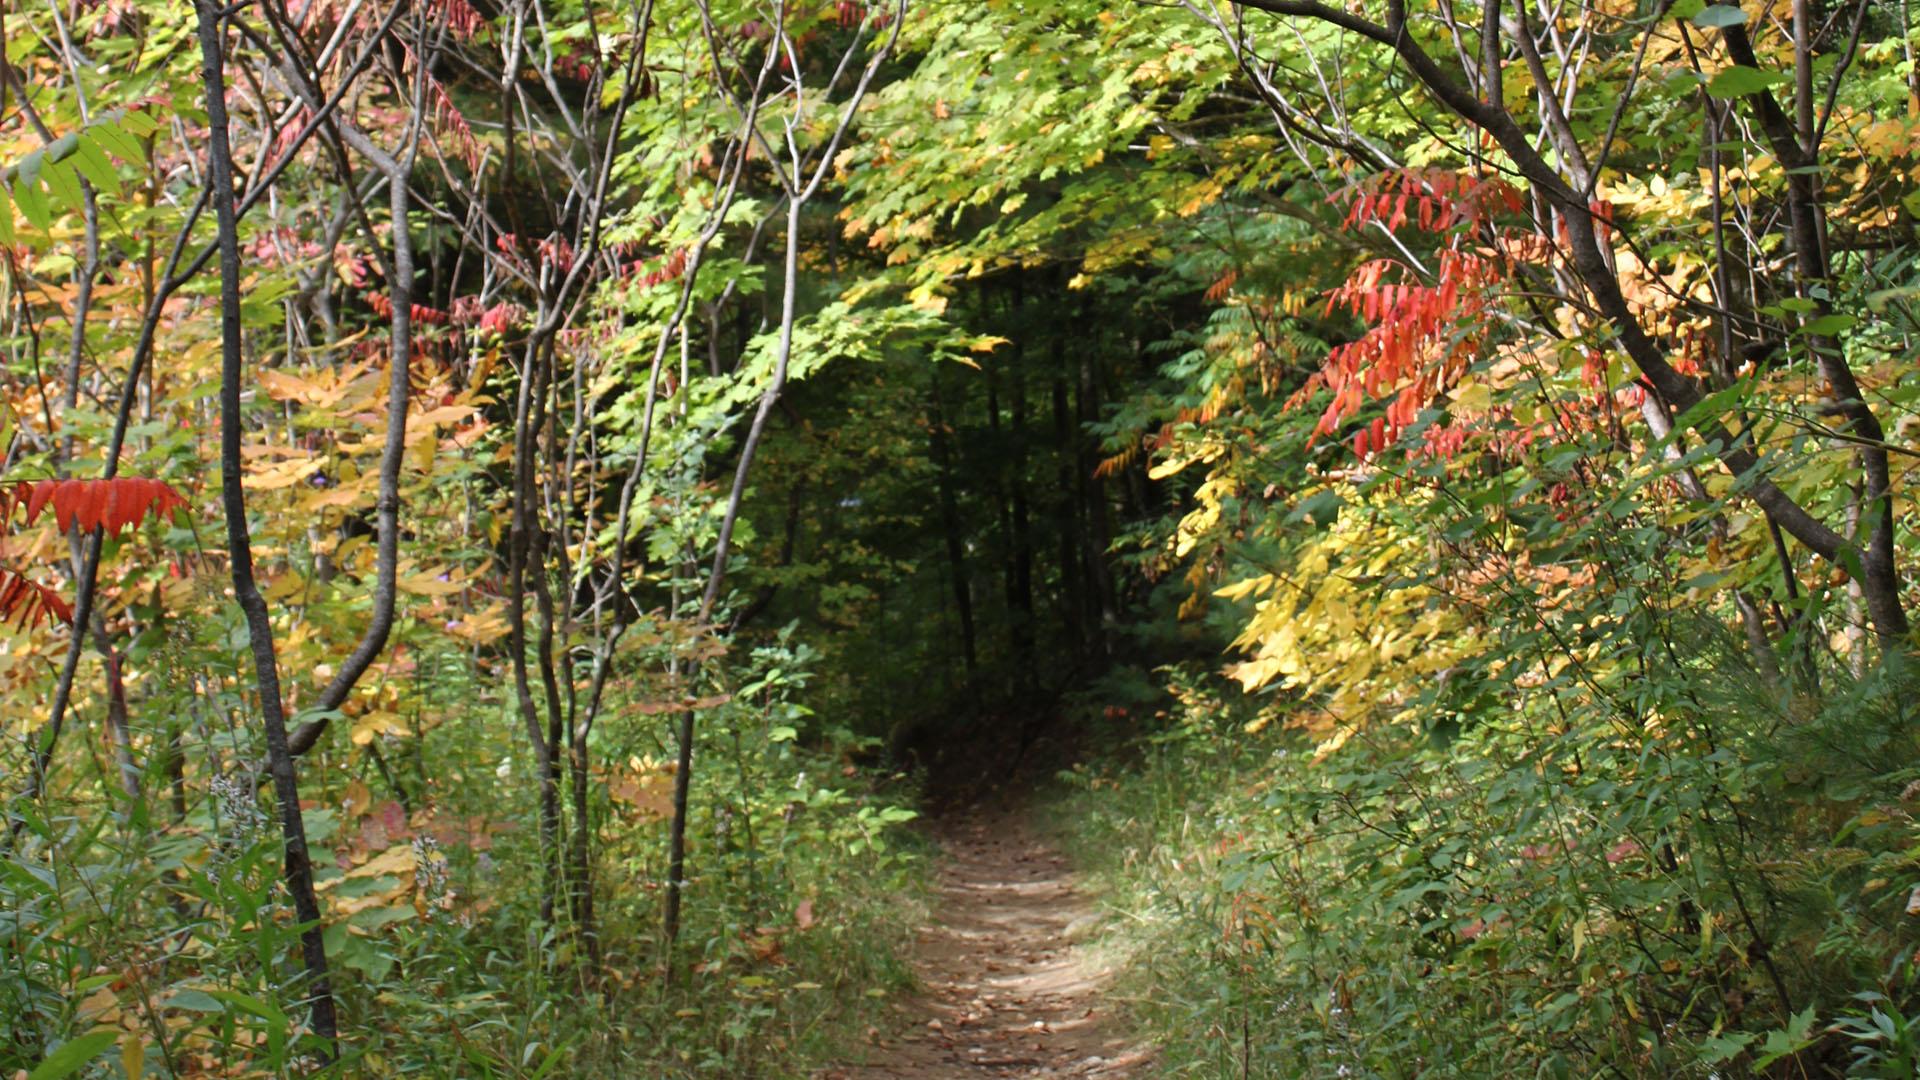 Trail Blog Photos - Fall Hiking Routes